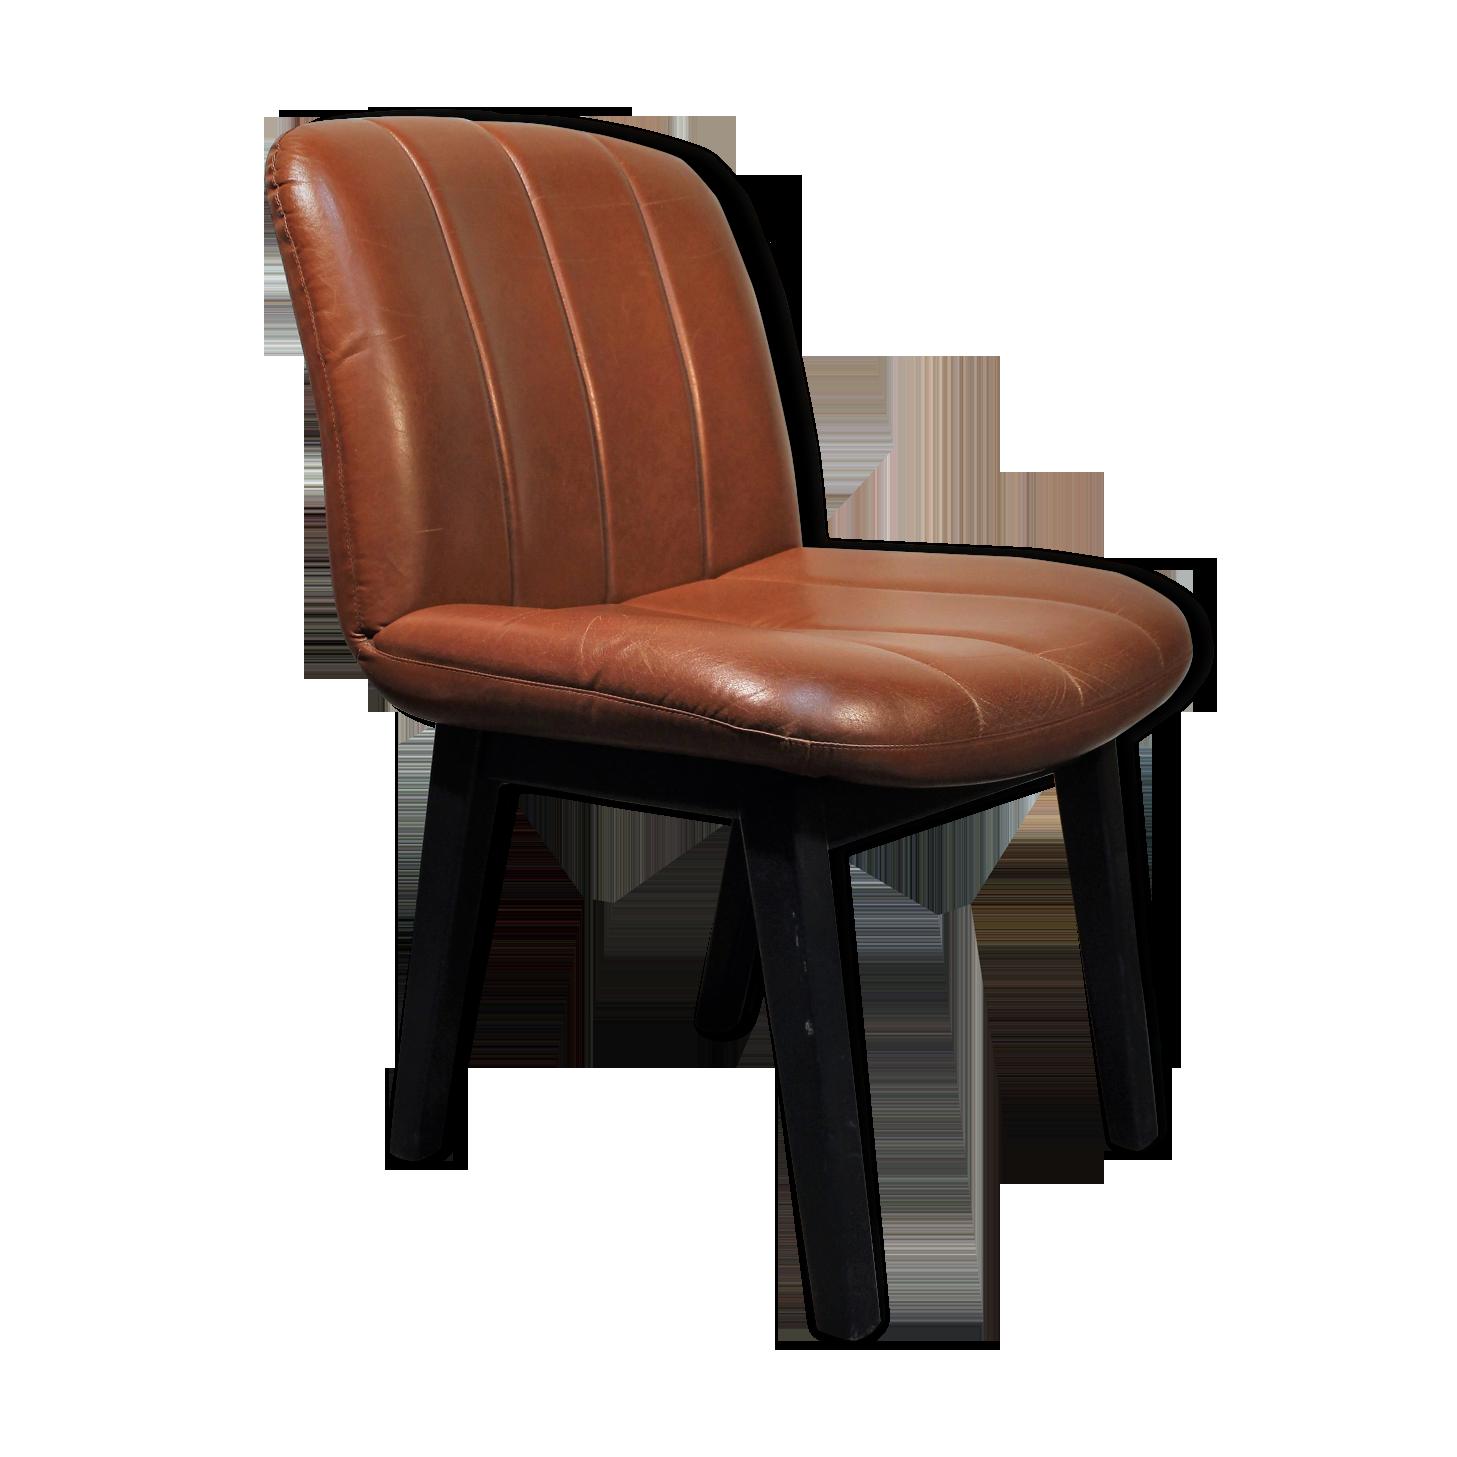 Chaise de bureau cuir bois cuir marron vintage mktcnhh